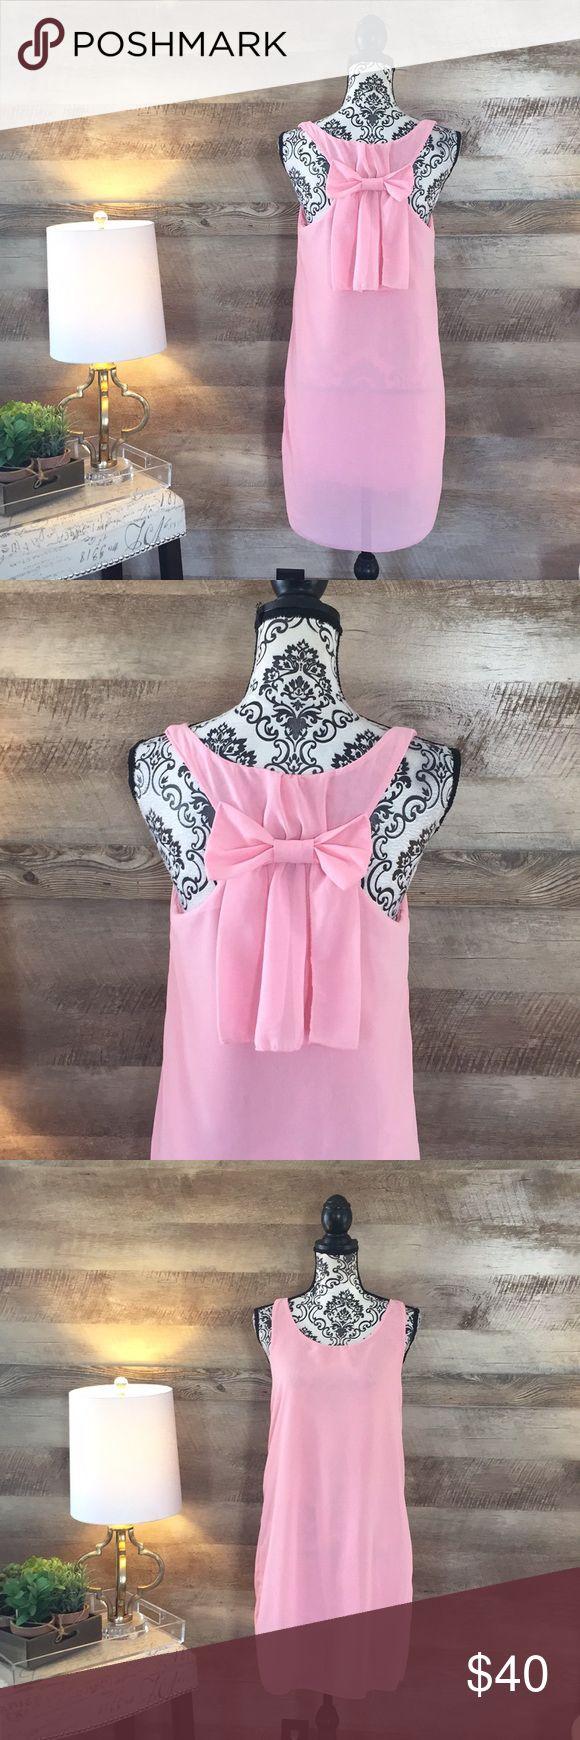 Sweet Bow Back Classic Sheath Dress Size medium. Pink. Bow Back design. Lined. Sleeveless. Dresses Mini